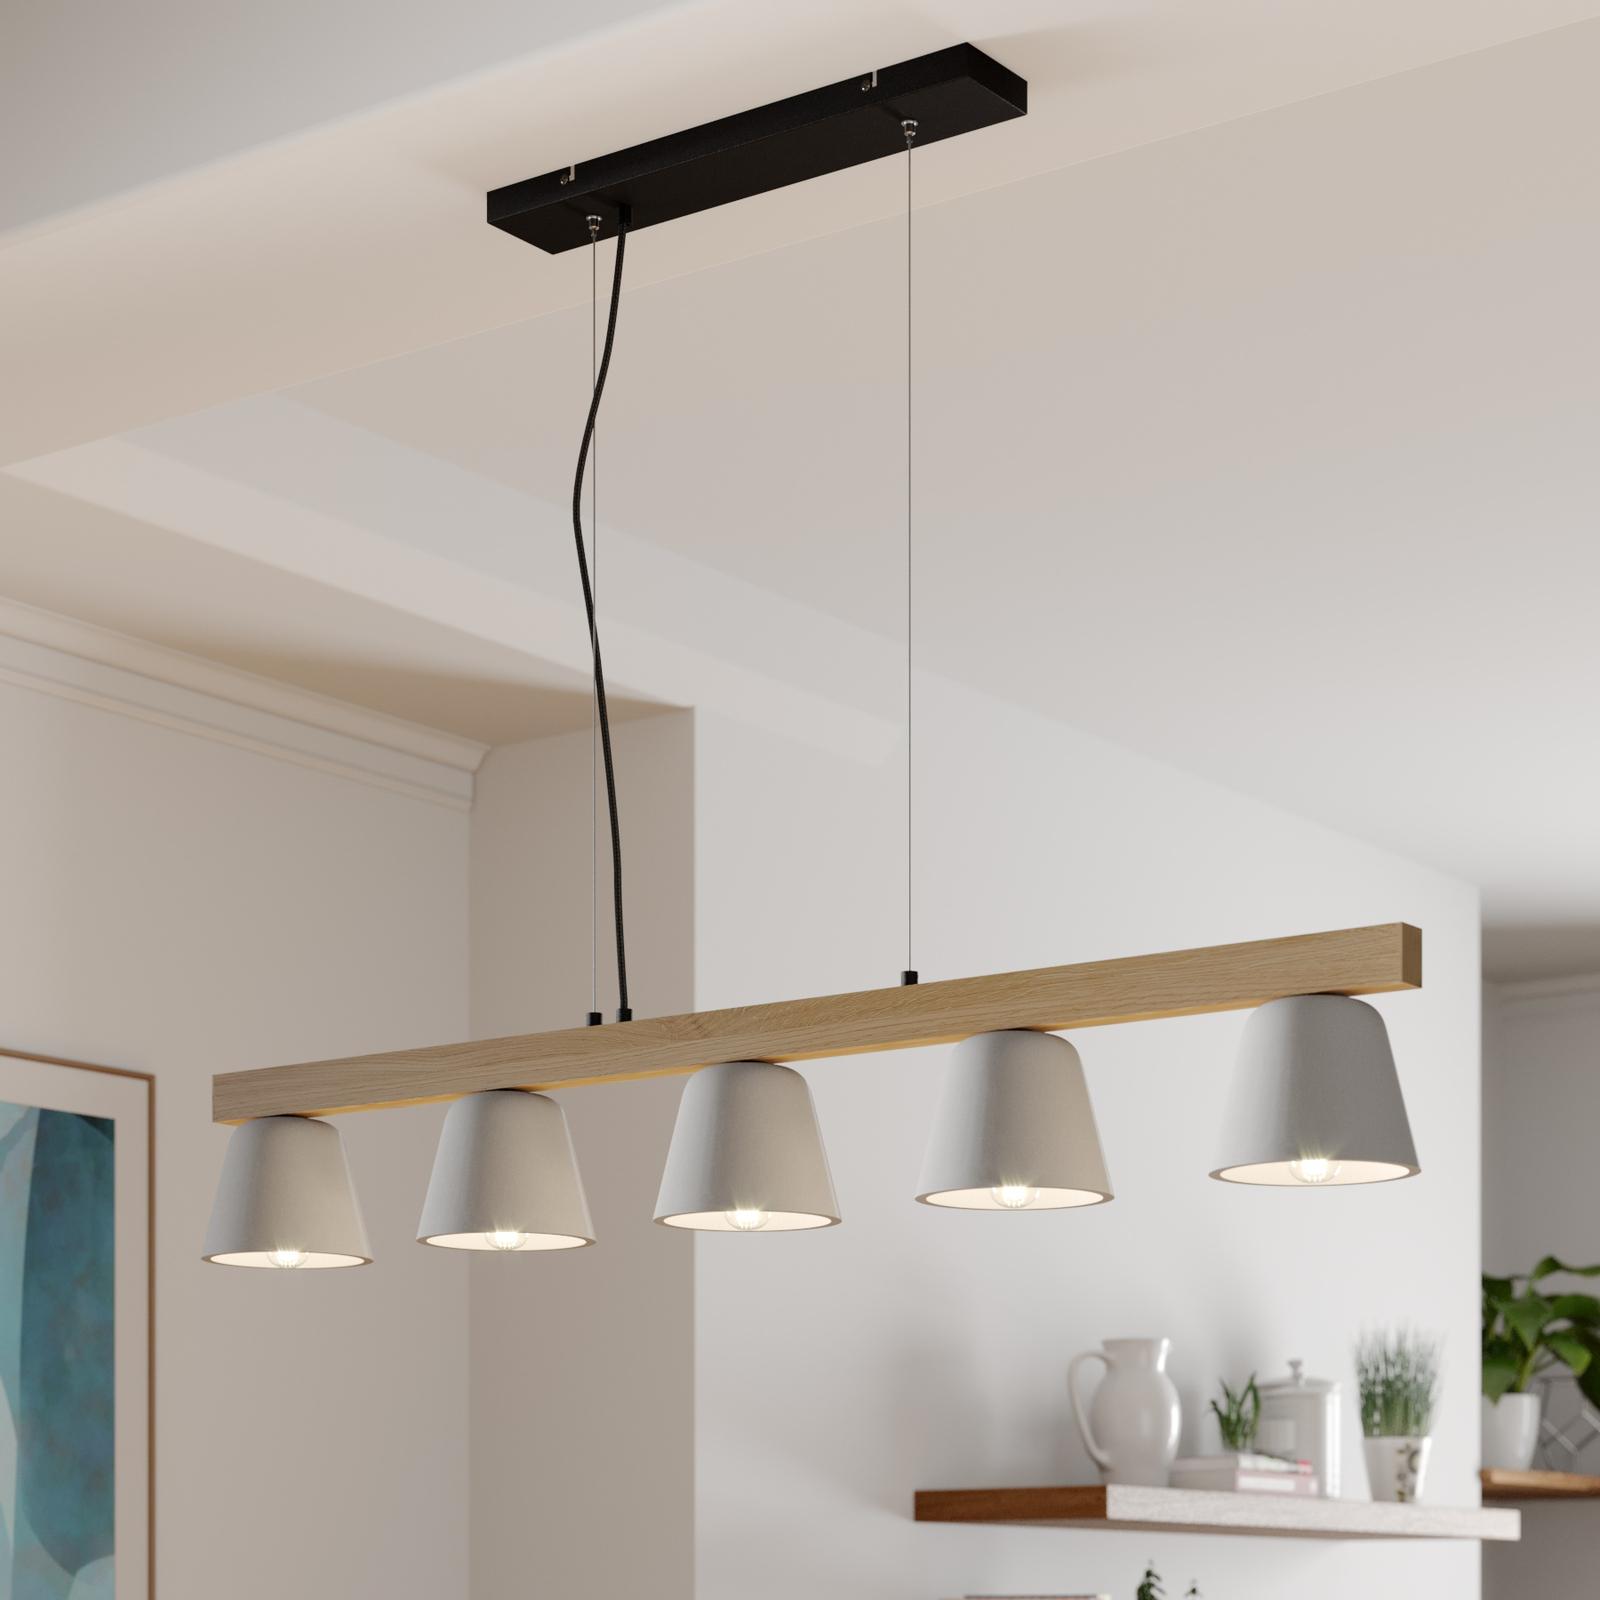 Lucande Kalinda hængelampe, beton, 5 lyskilder